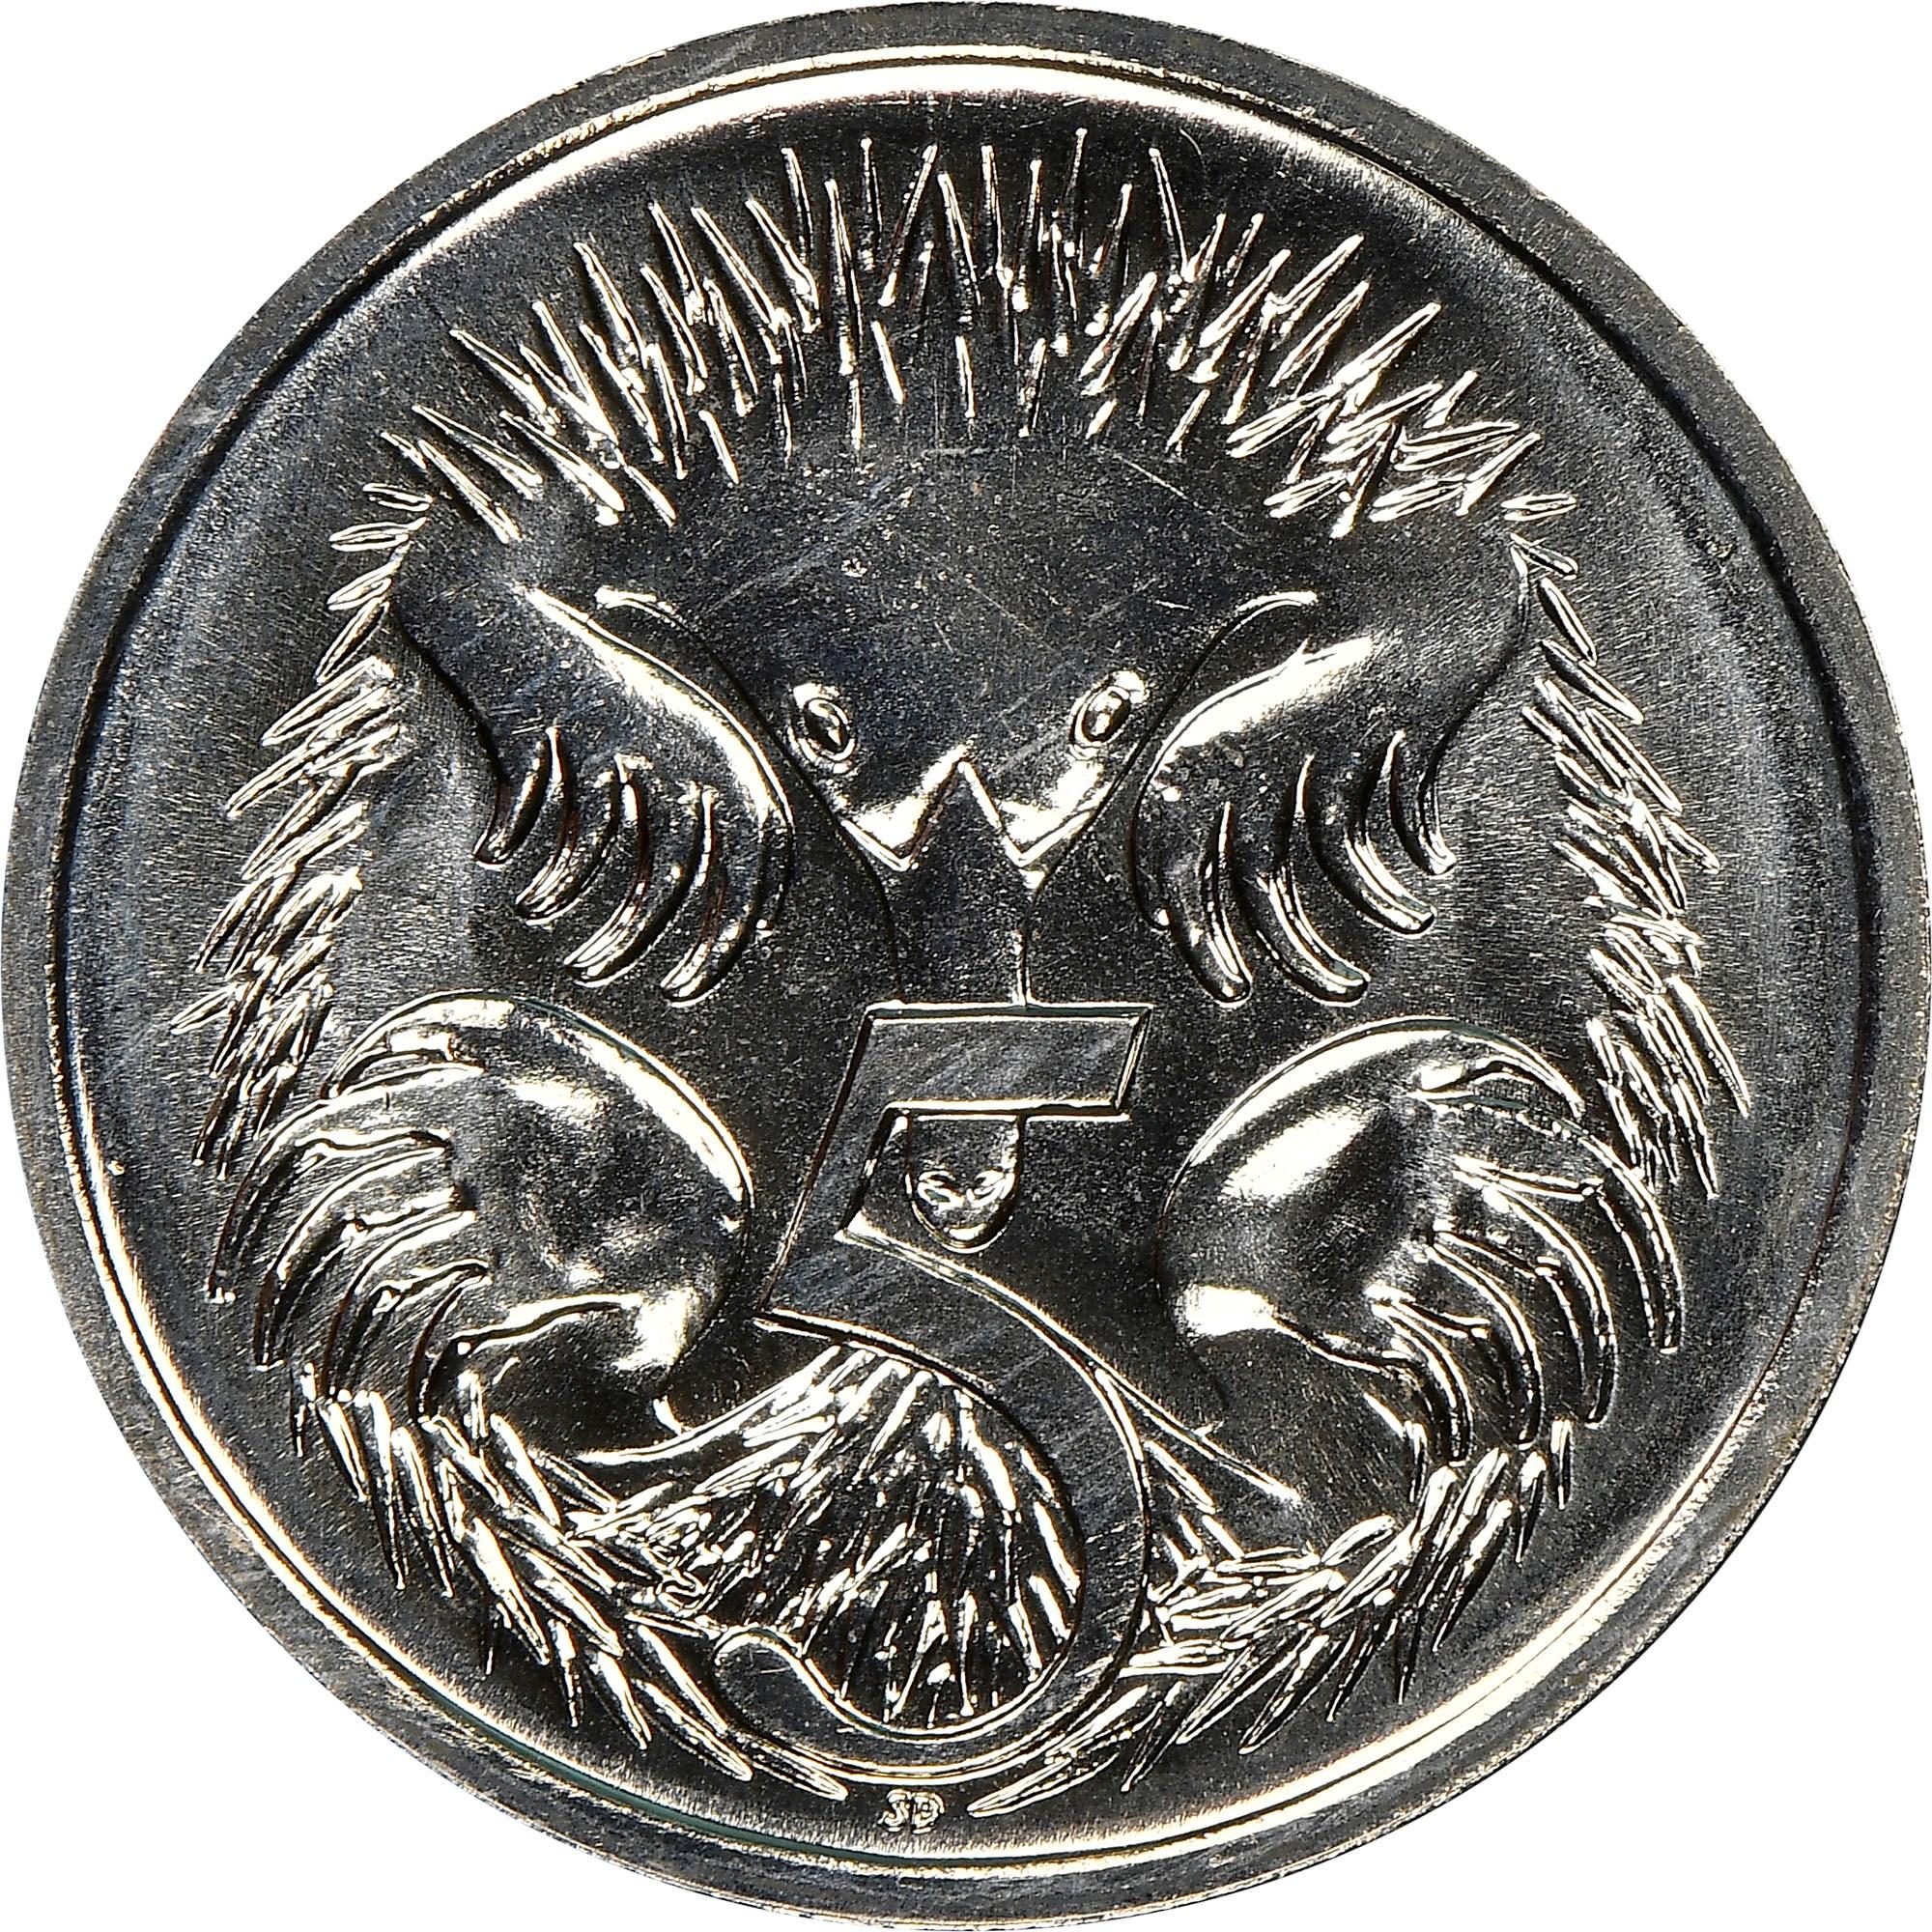 Australia 5 Cents reverse